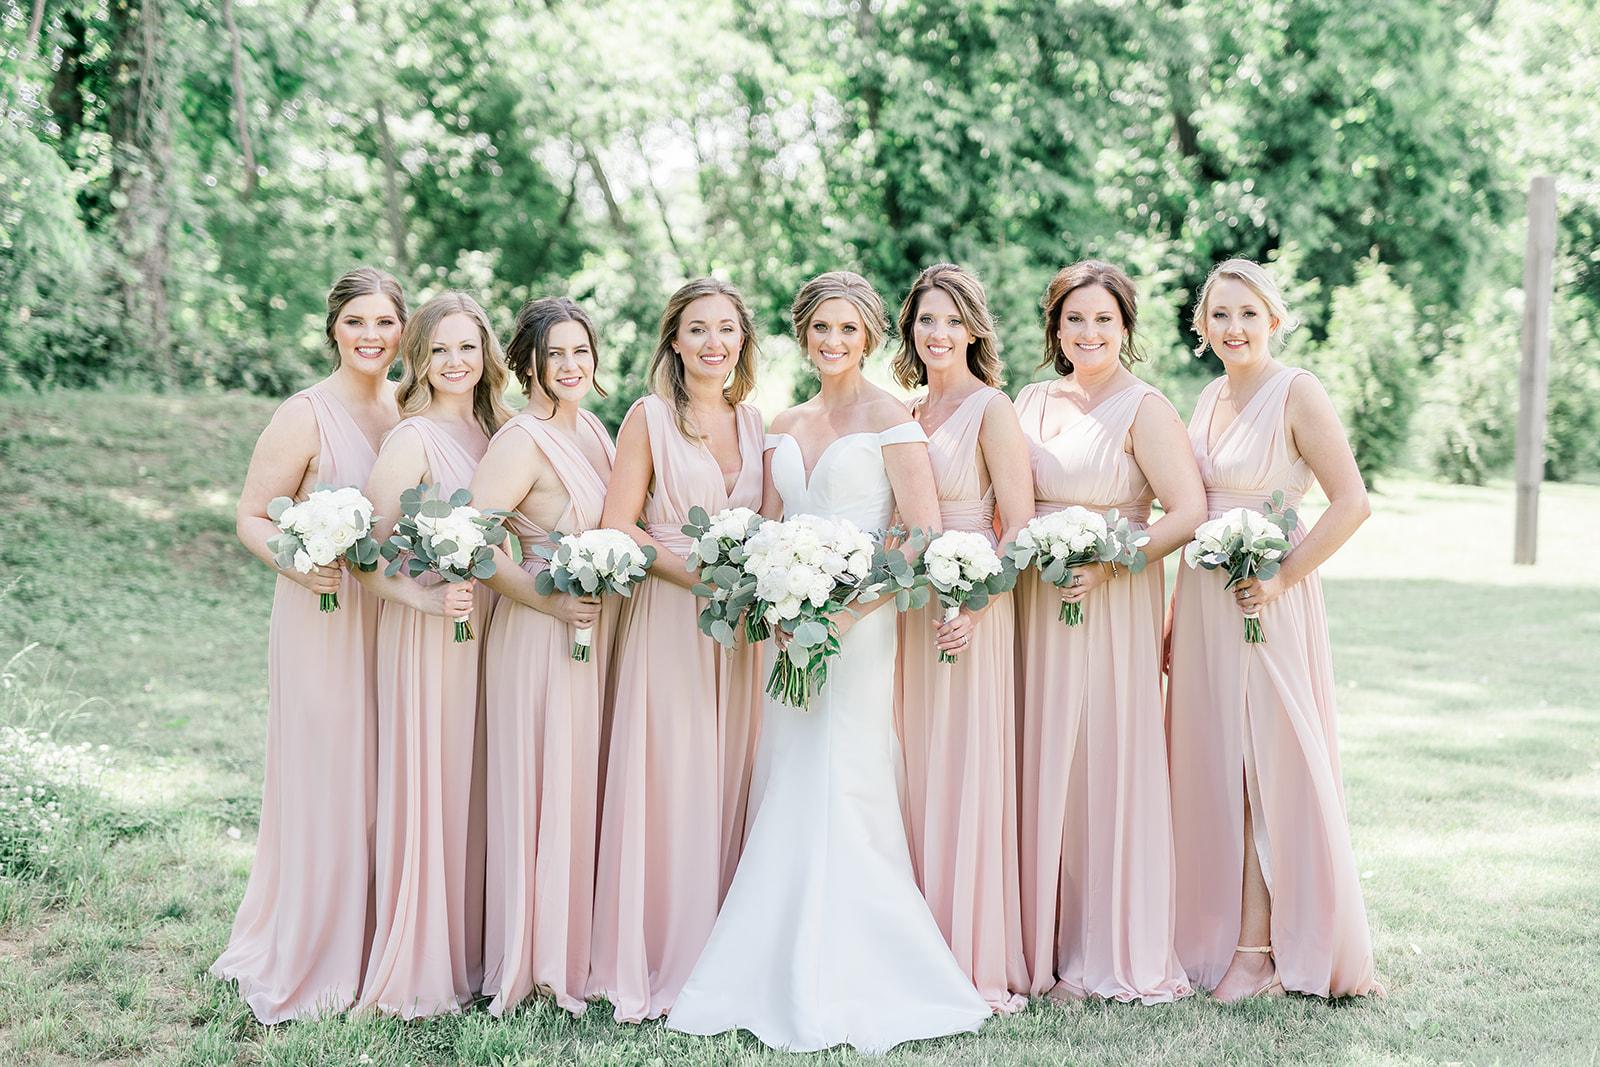 blush_wedding_at_white_oak_farms_medina_tn-08670.jpg